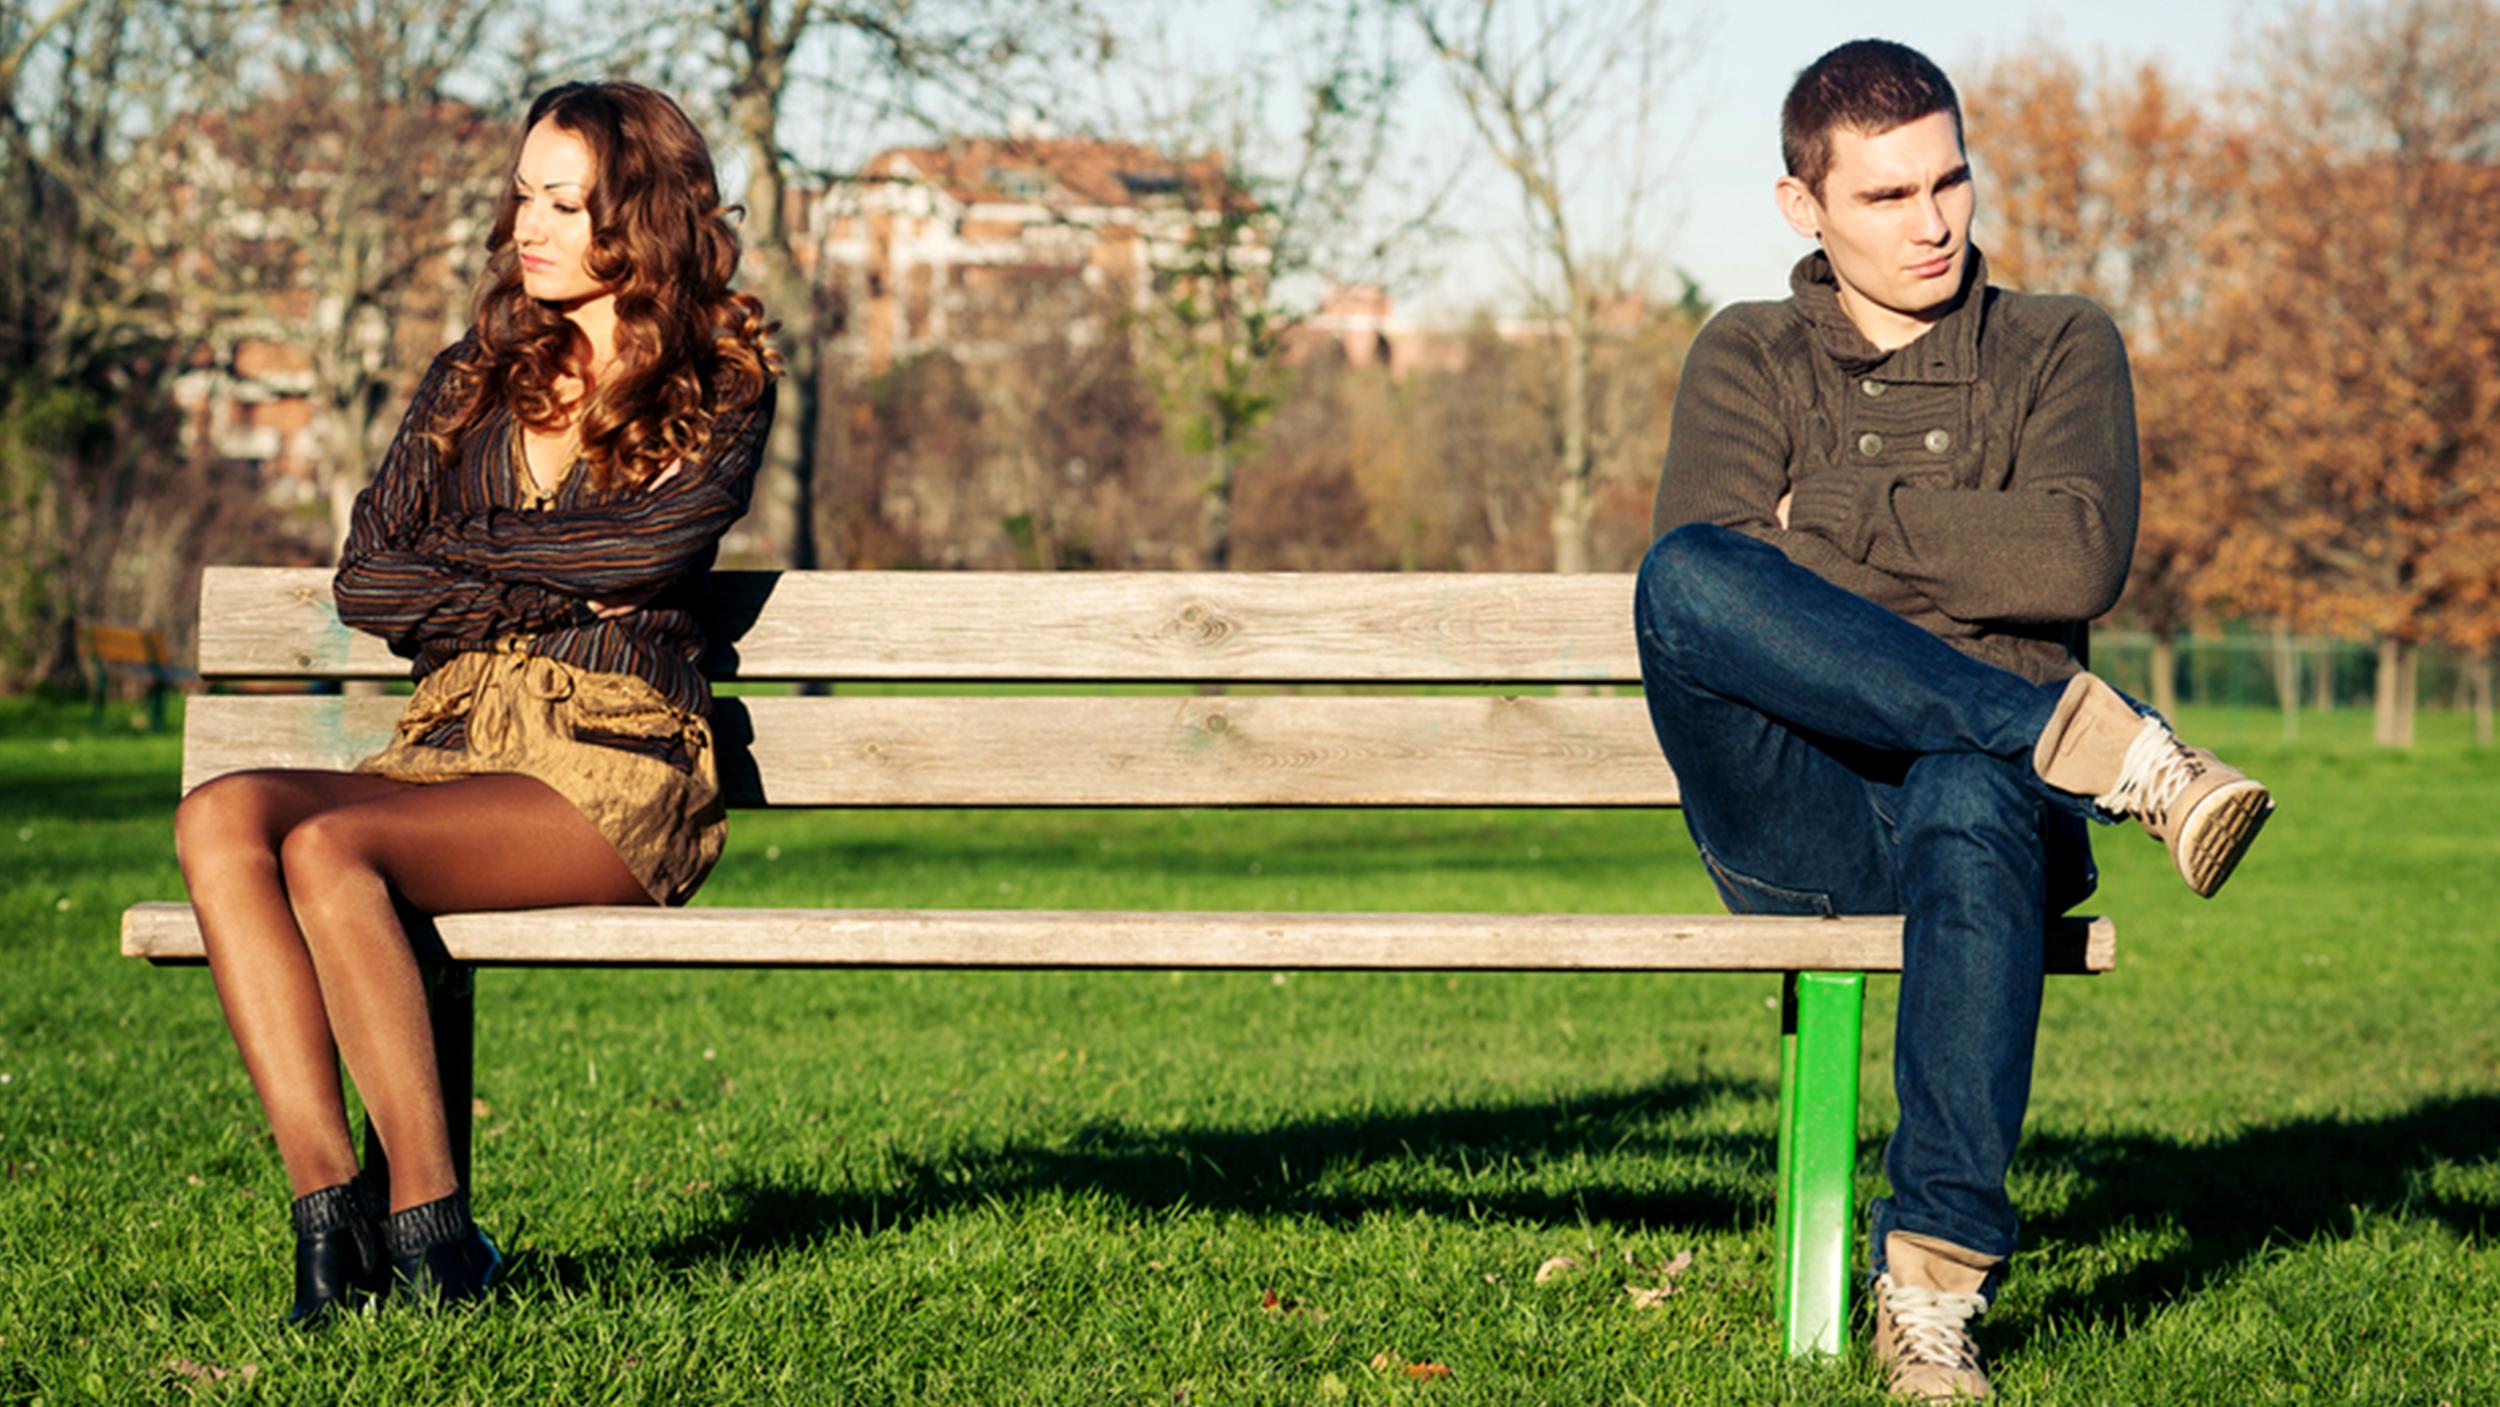 angry-upset-couple-stock-today-150722-tease_e5a7724f858728ecd9409155de658d62.jpg